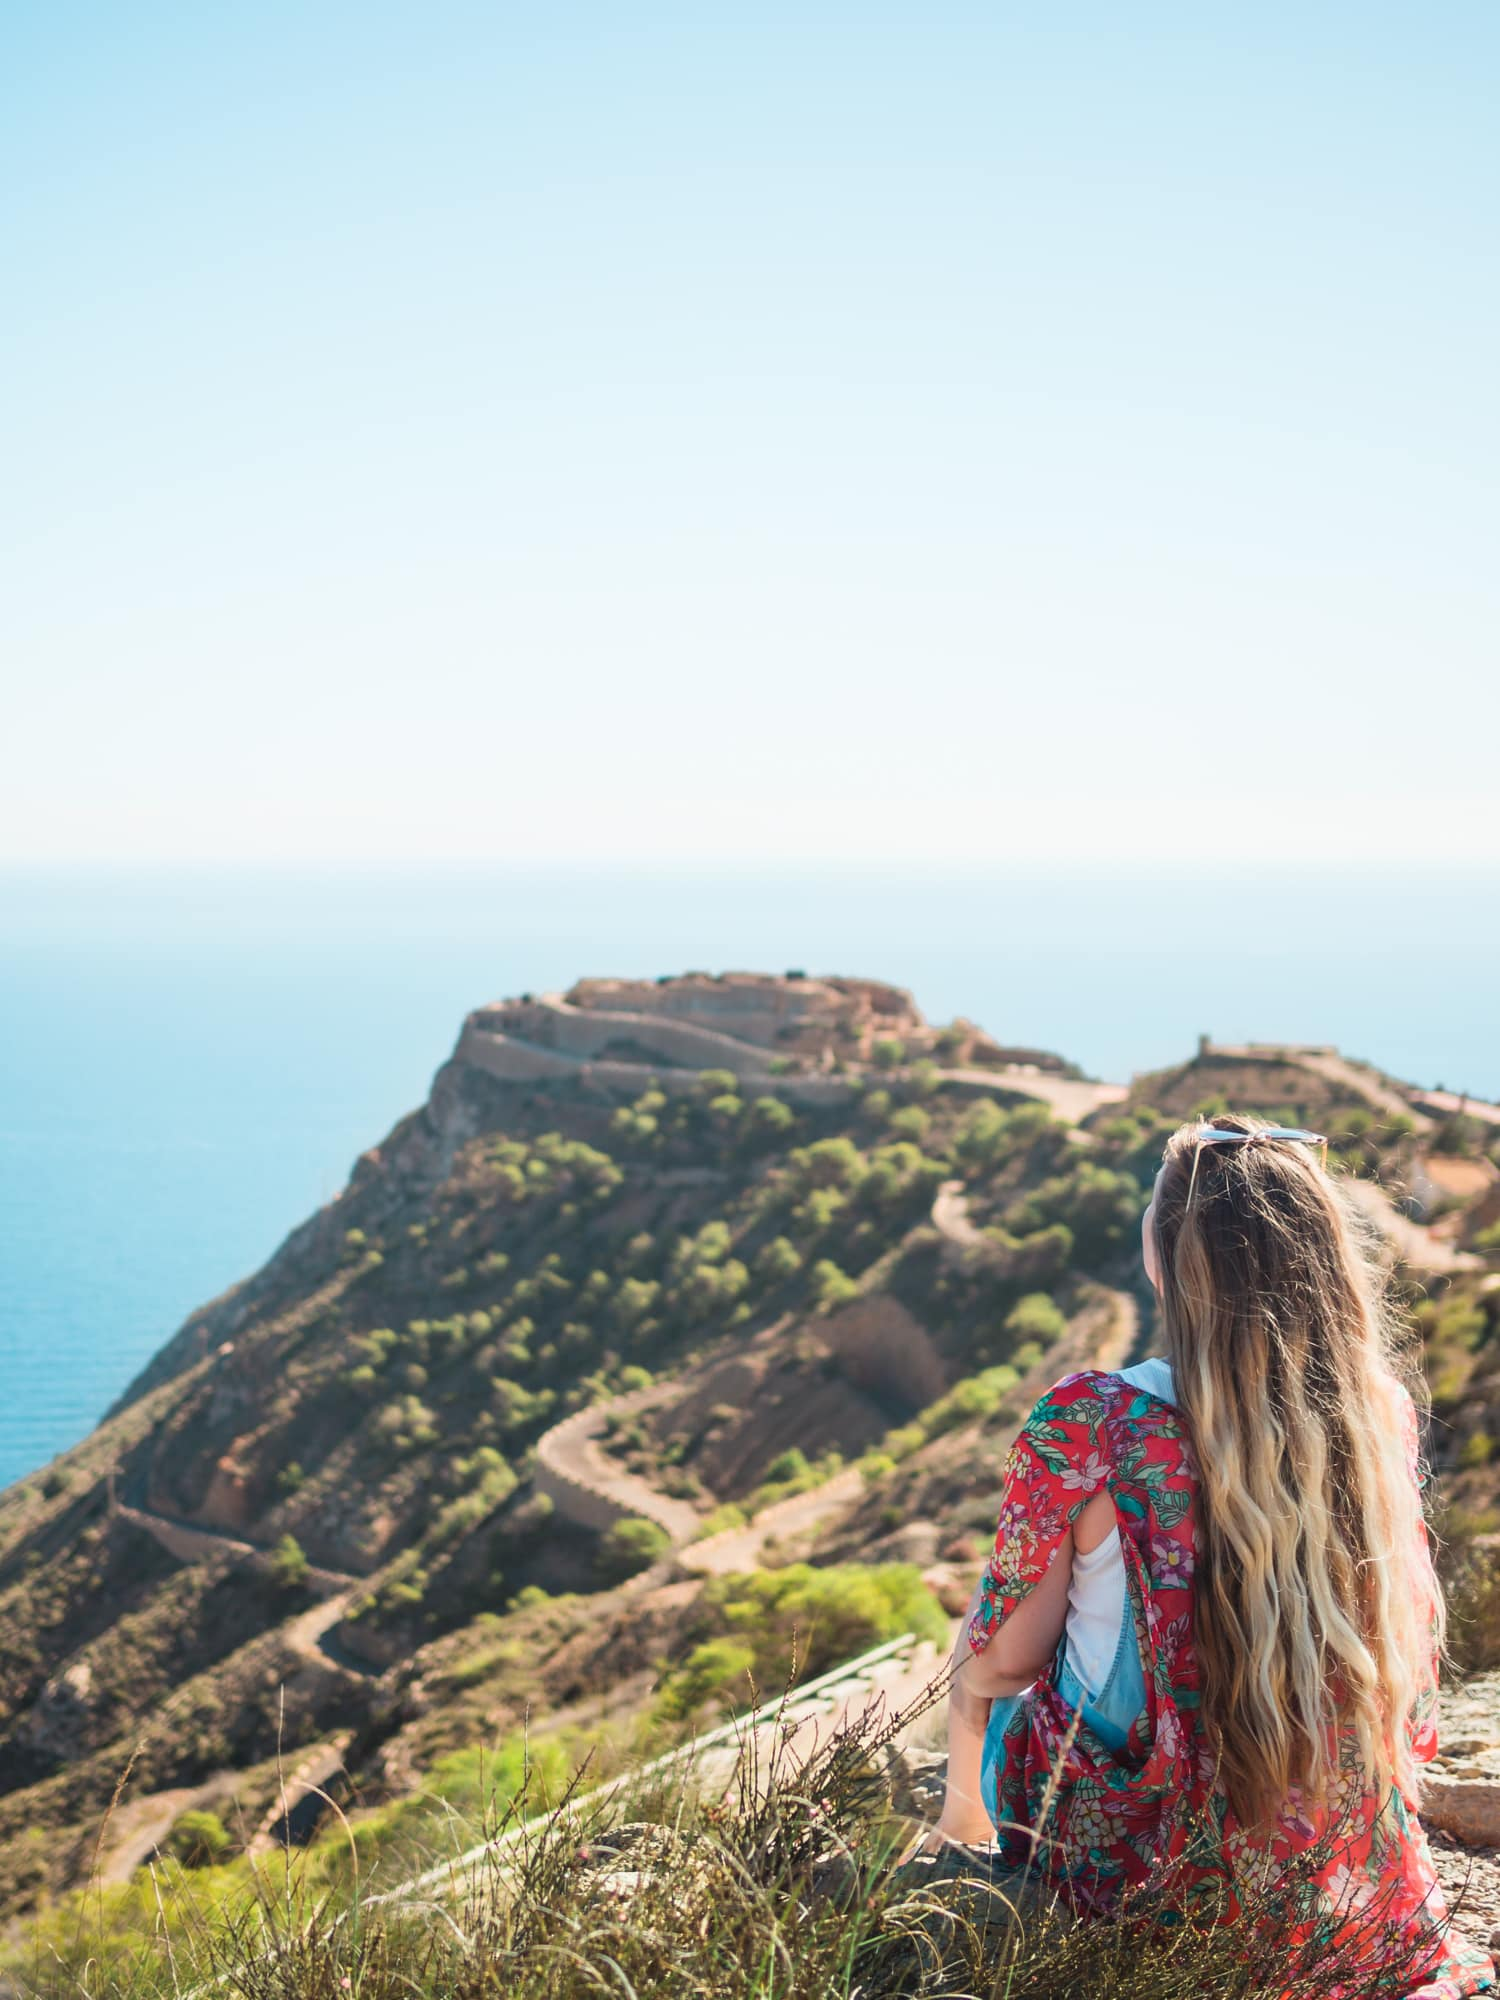 Bateria de Castillitos outside Cartagena in Murcia, Spain - Favorites 2017 travel blog